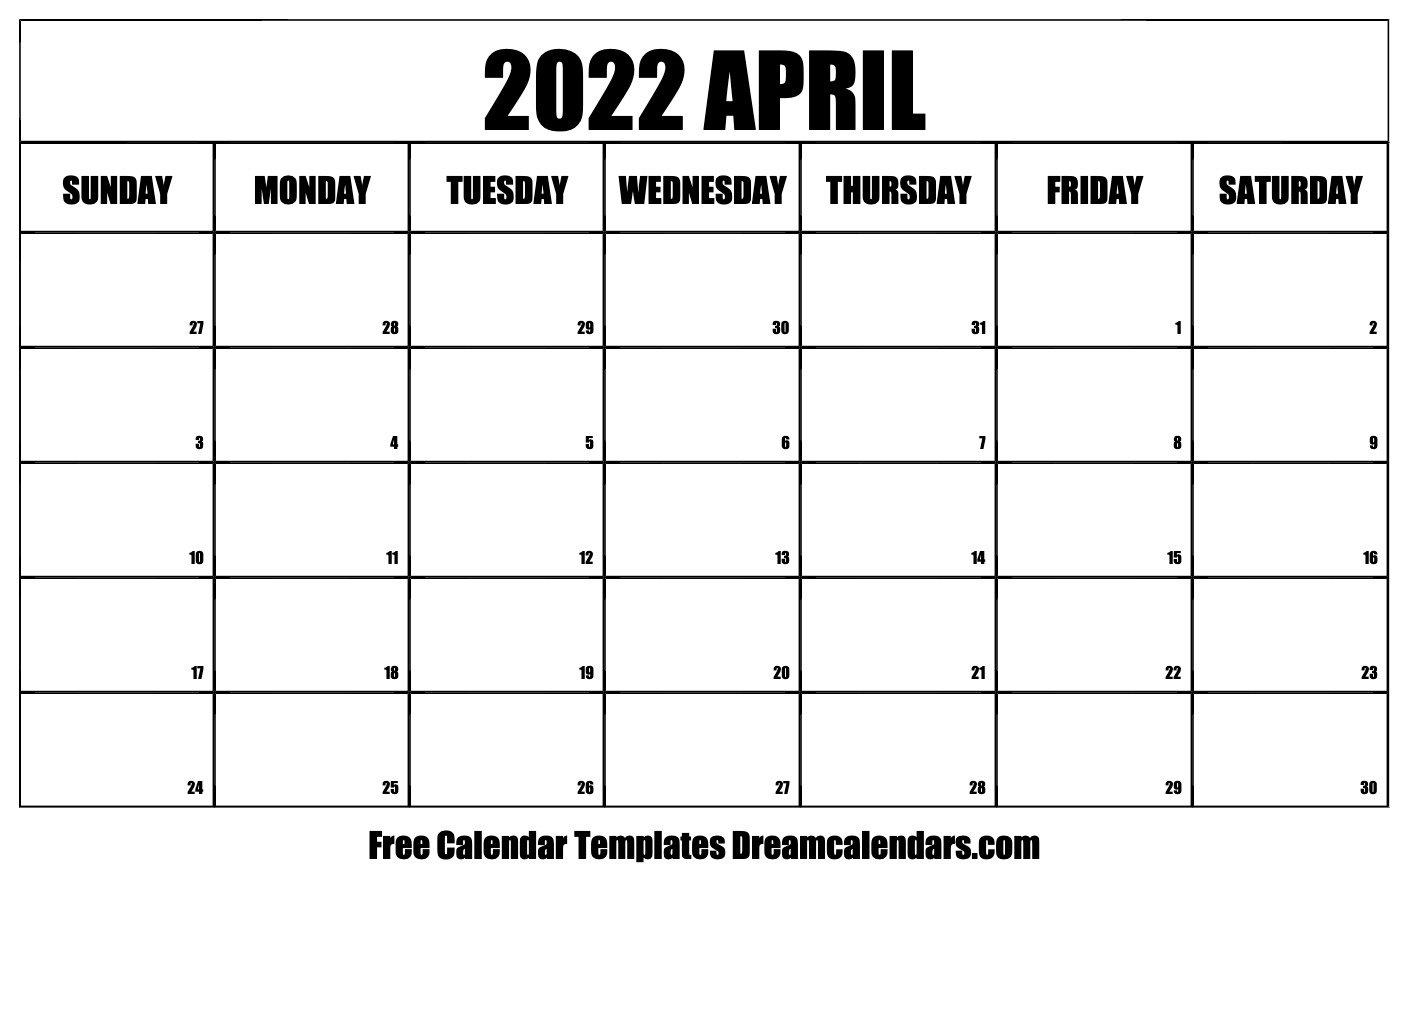 April 2022 Calendar   Free Blank Printable Templates for March April May 2022 Calendar Printable Graphics